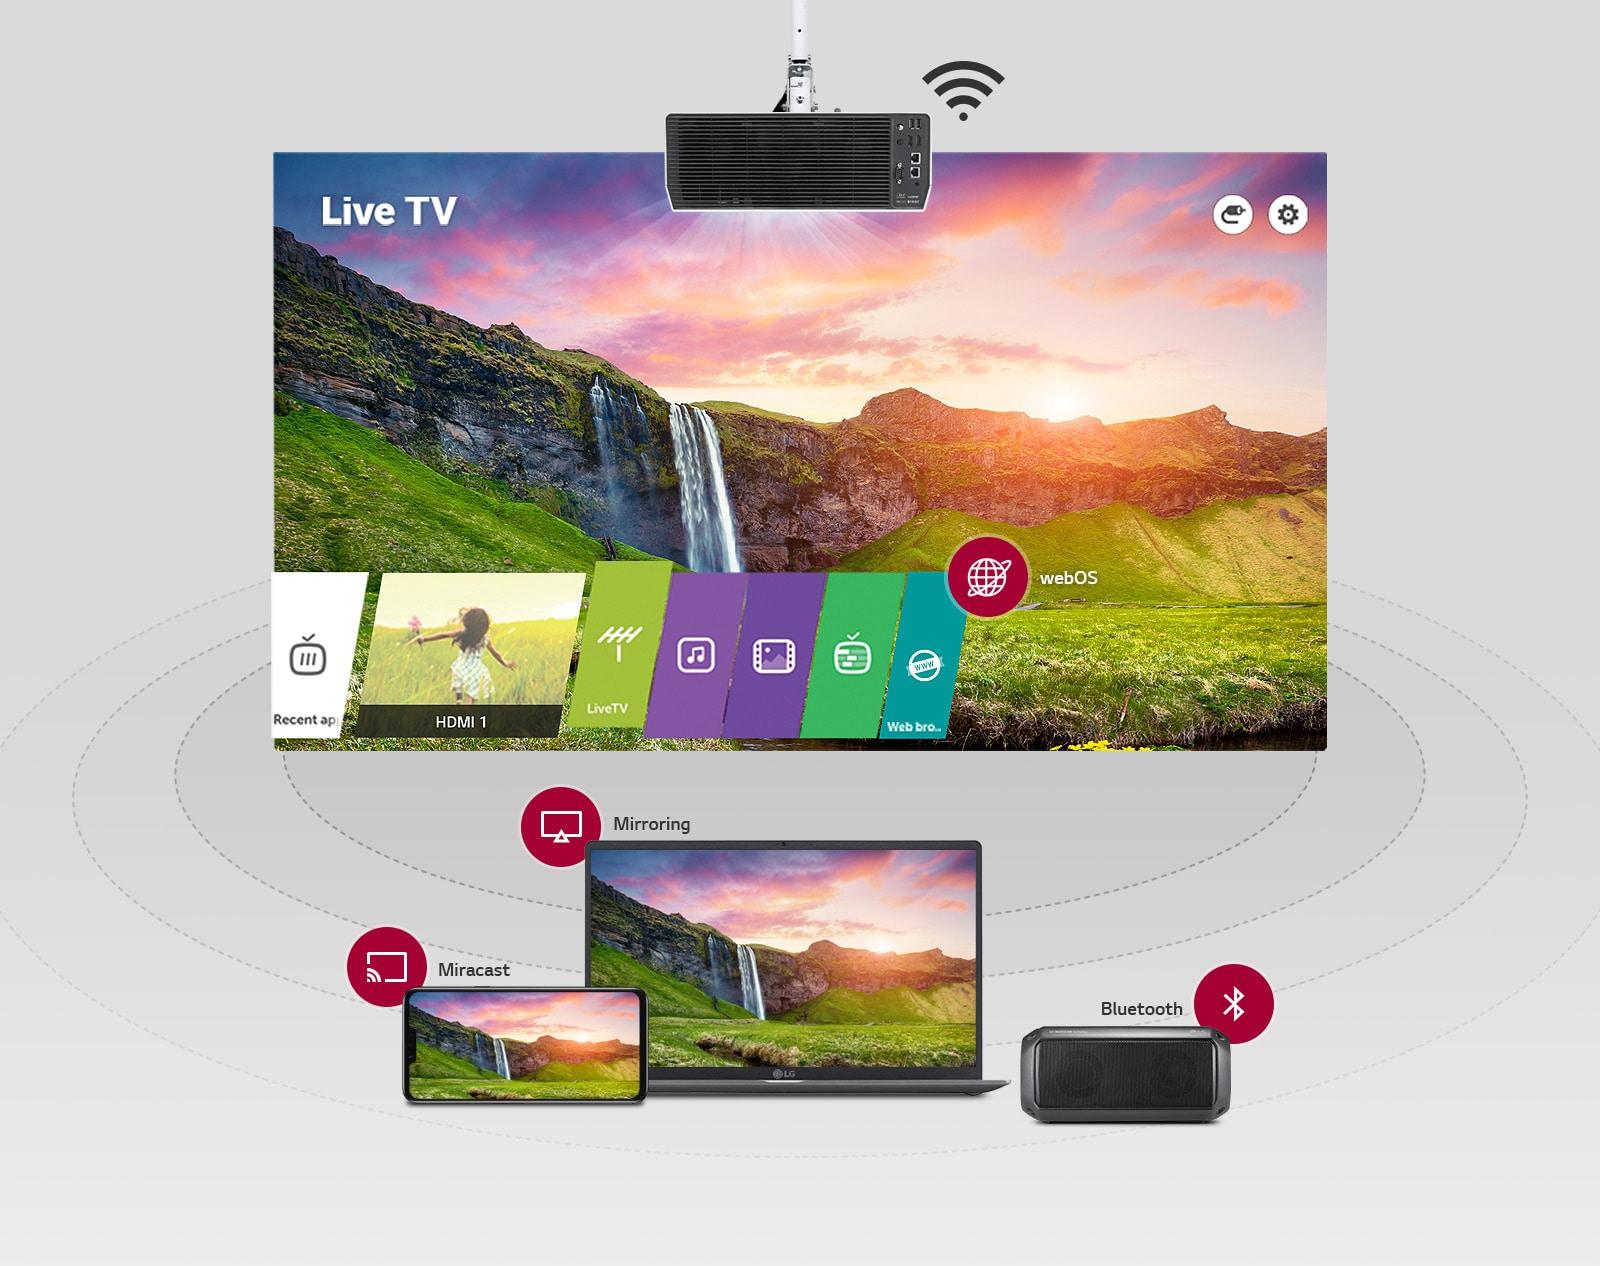 LiveTV webOS Recent app HDMI 1 LiveTV Web bro Mirroring Miracast Bluetooth